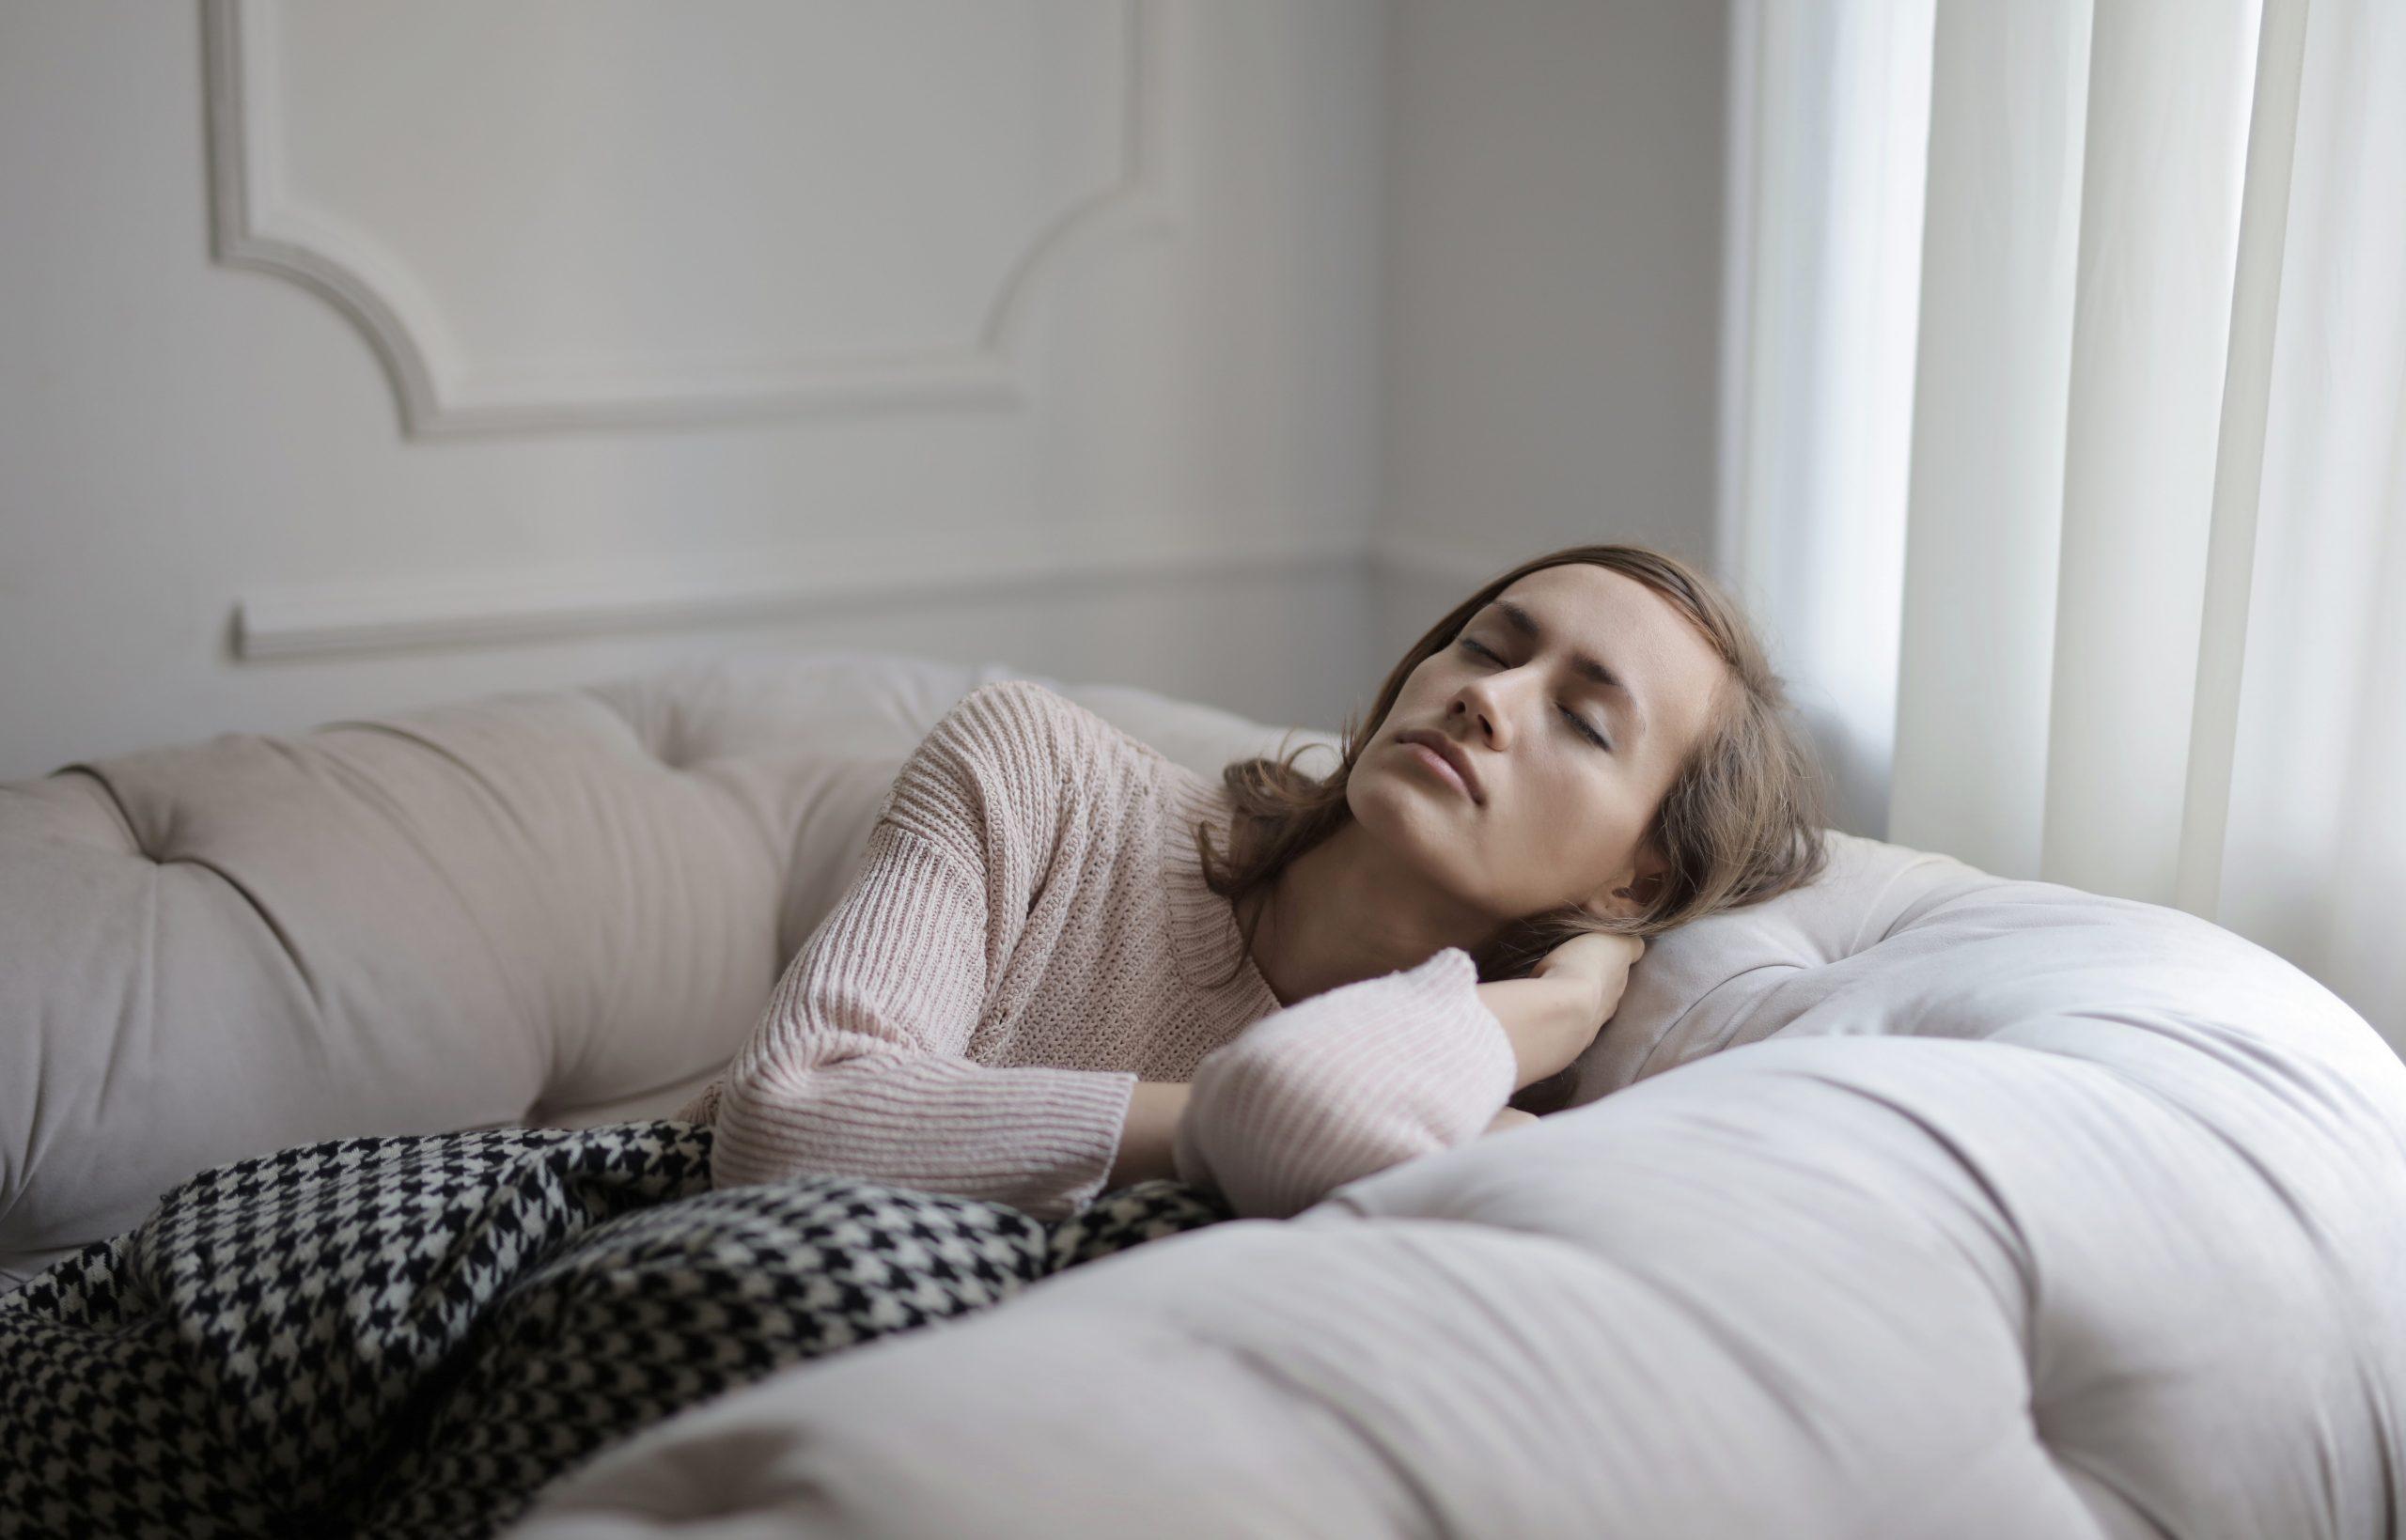 Coronavírus: dormir é essencial